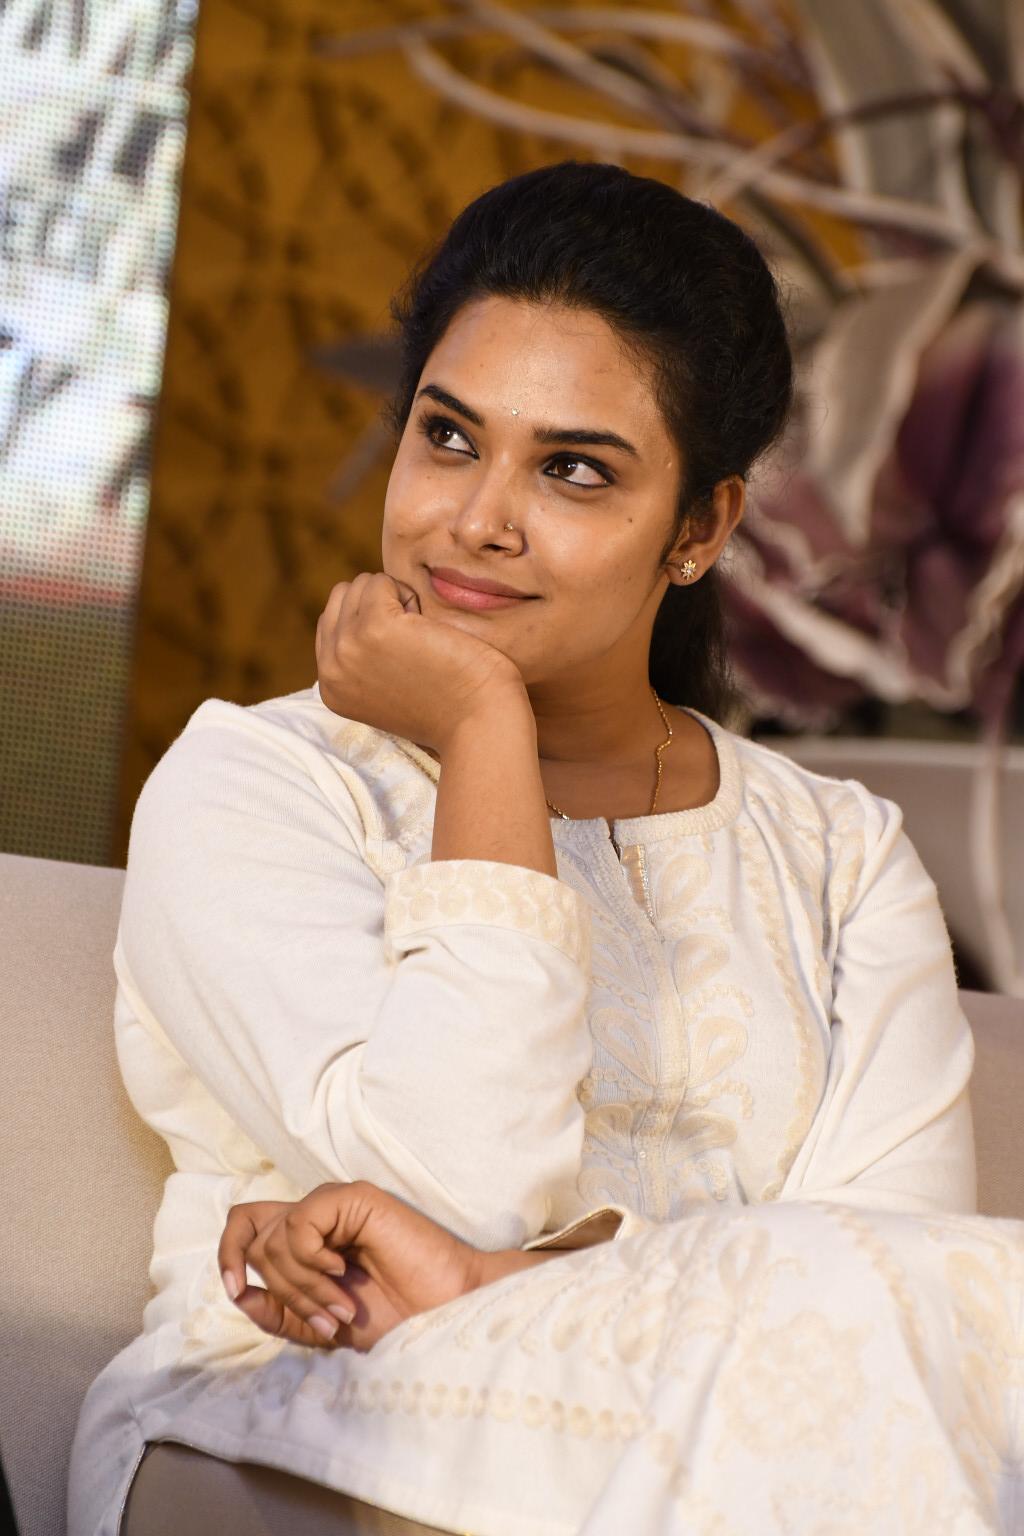 Tv Actress Hari Teja Hot Smiling Photos In White Dress